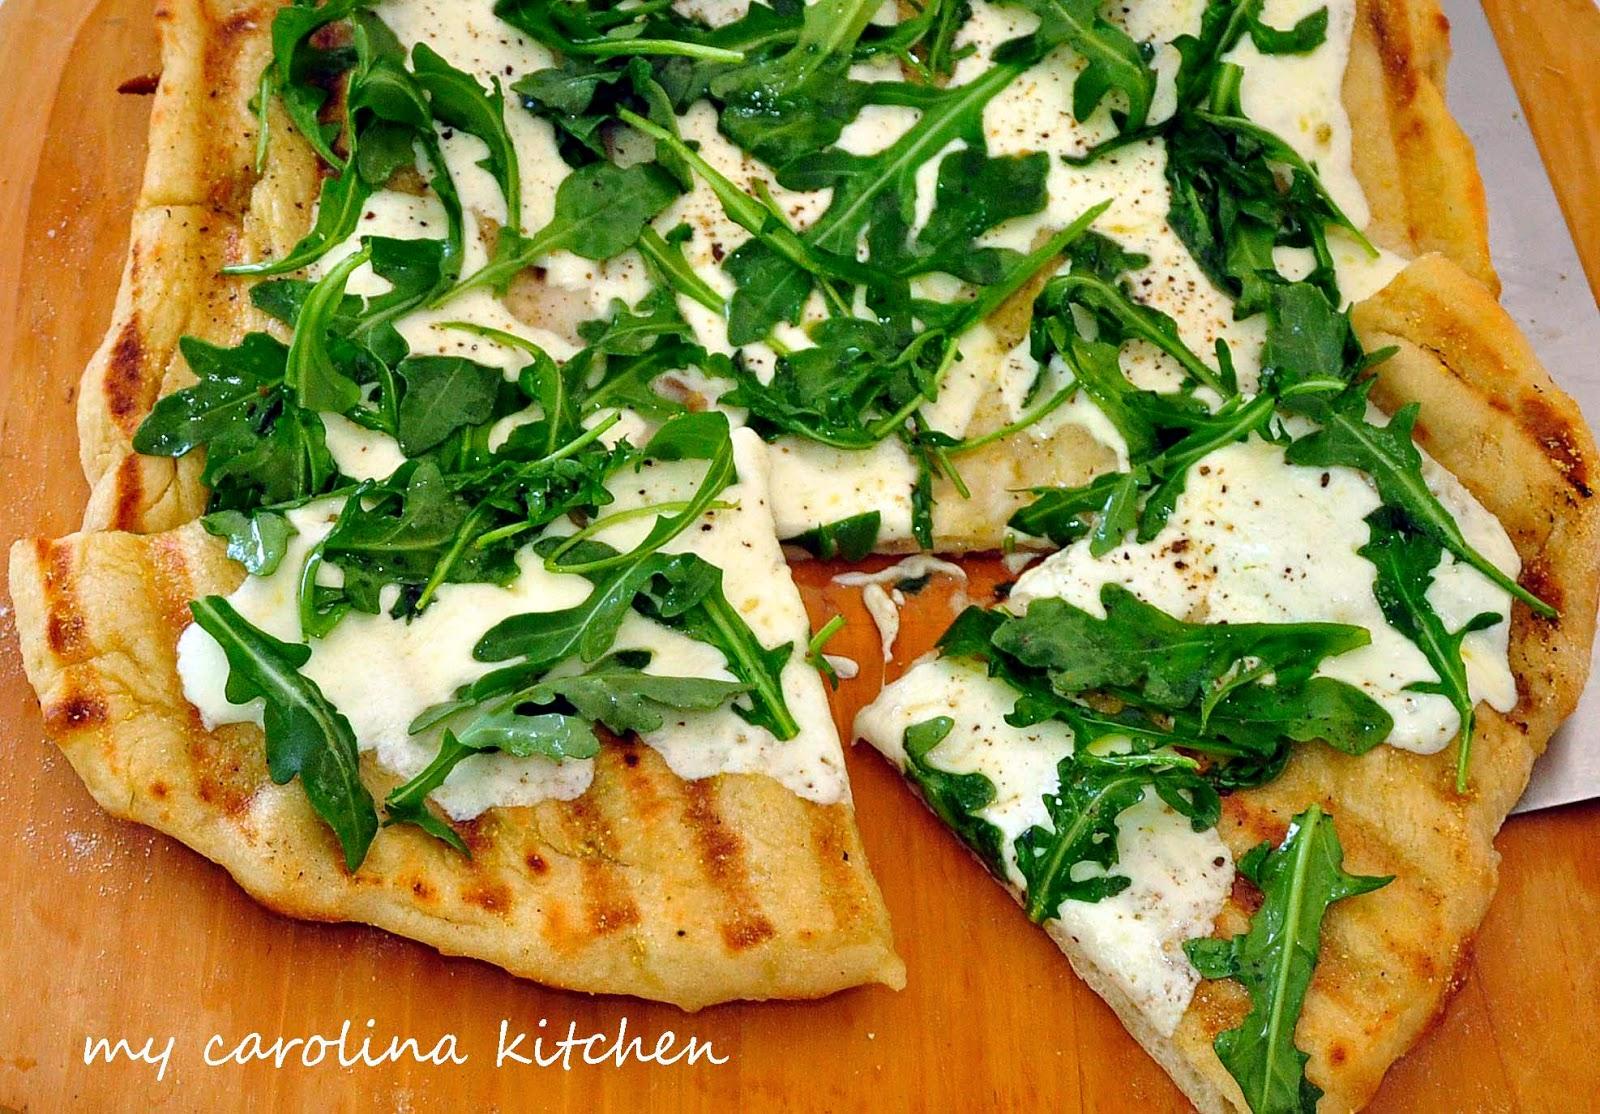 My Carolina Kitchen: Pizza on the Grill